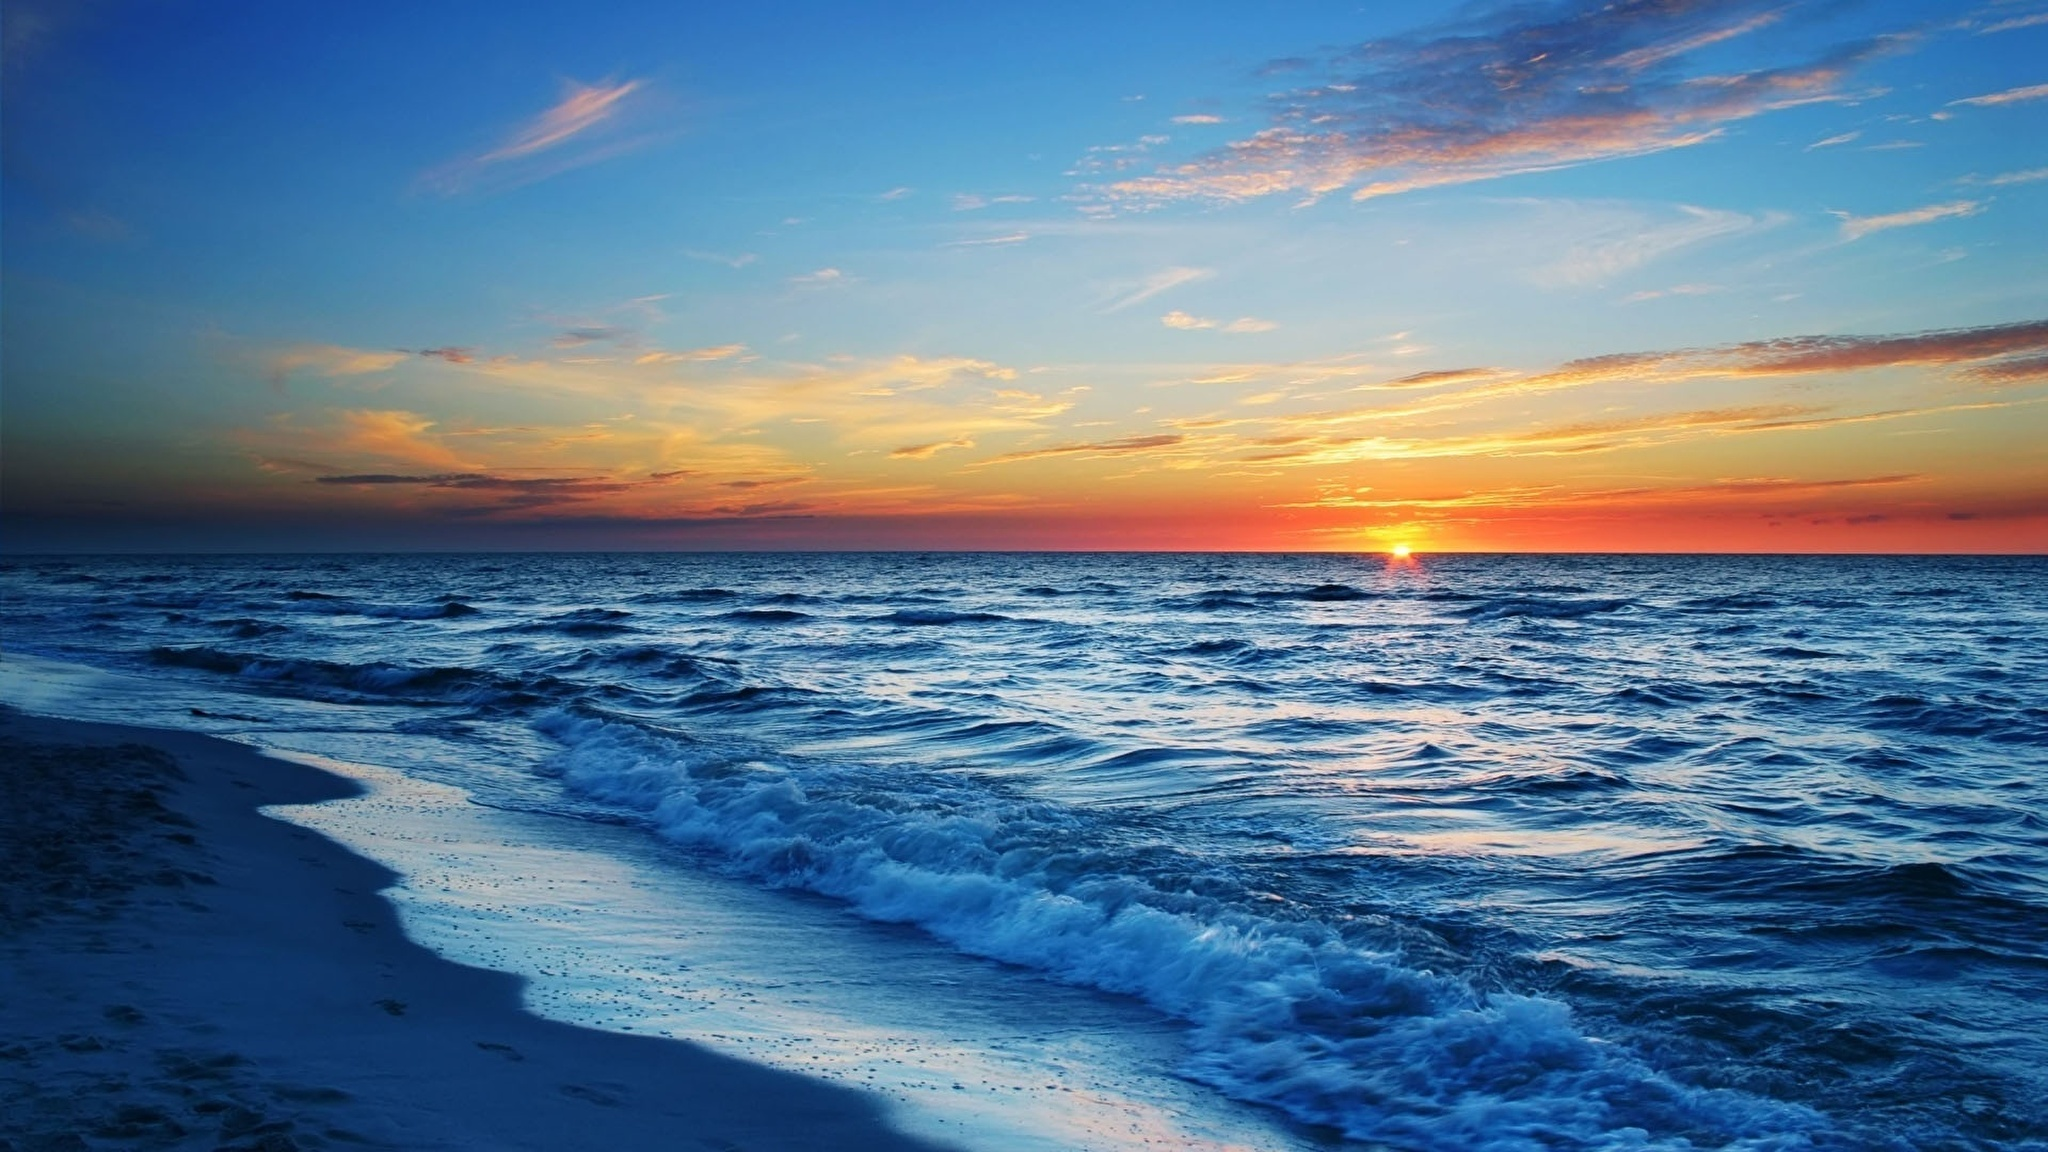 Пляж, закат, солнце, море, вода подборки